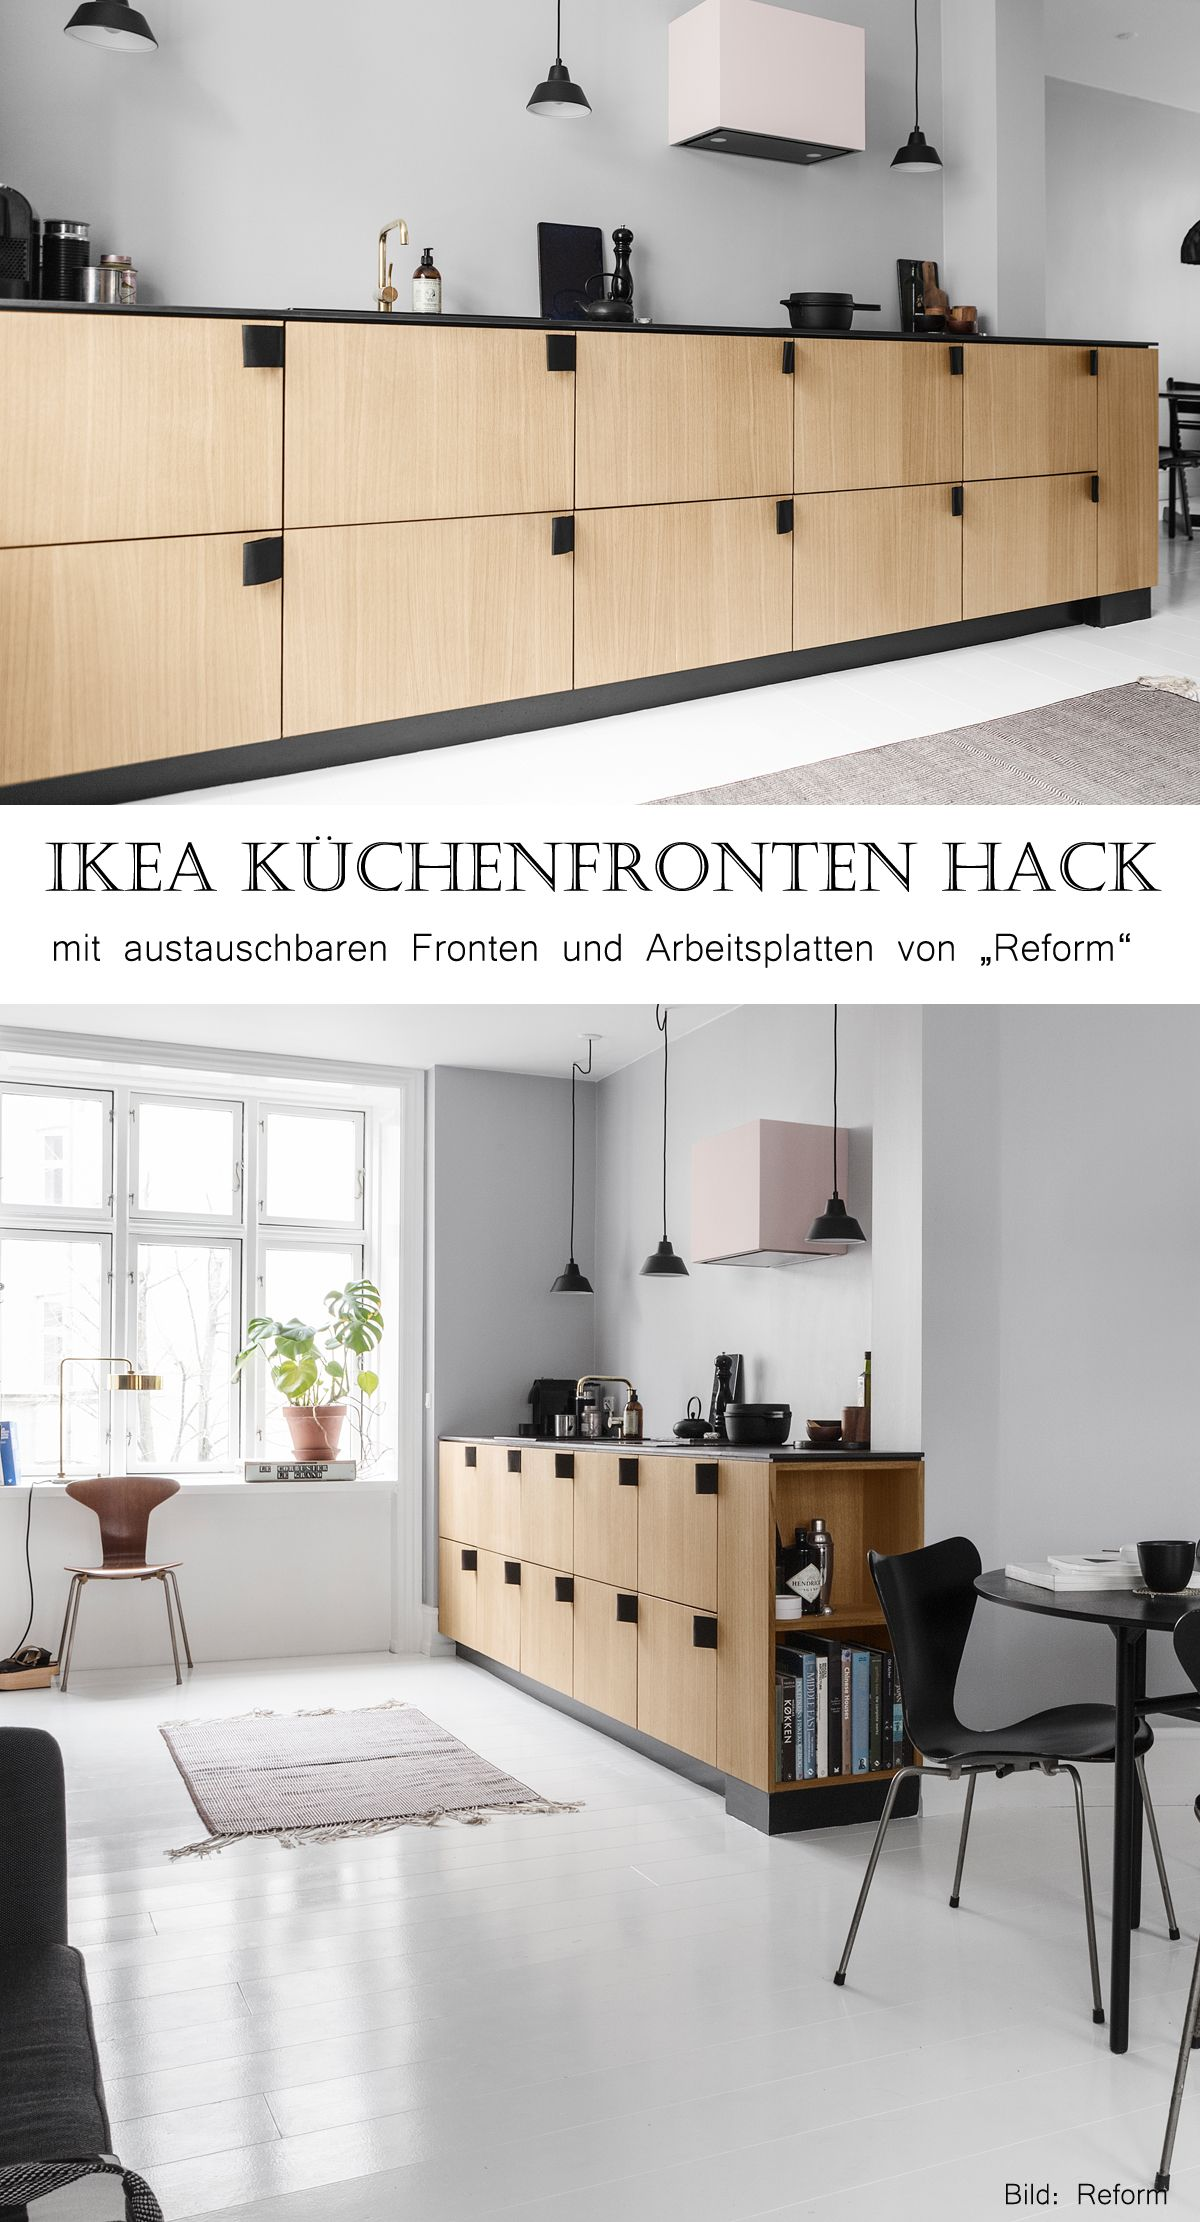 Ikea Kuchenfronten Pimpen Ikea Kuche Metod Ikea Kuche Kuchen Fronten